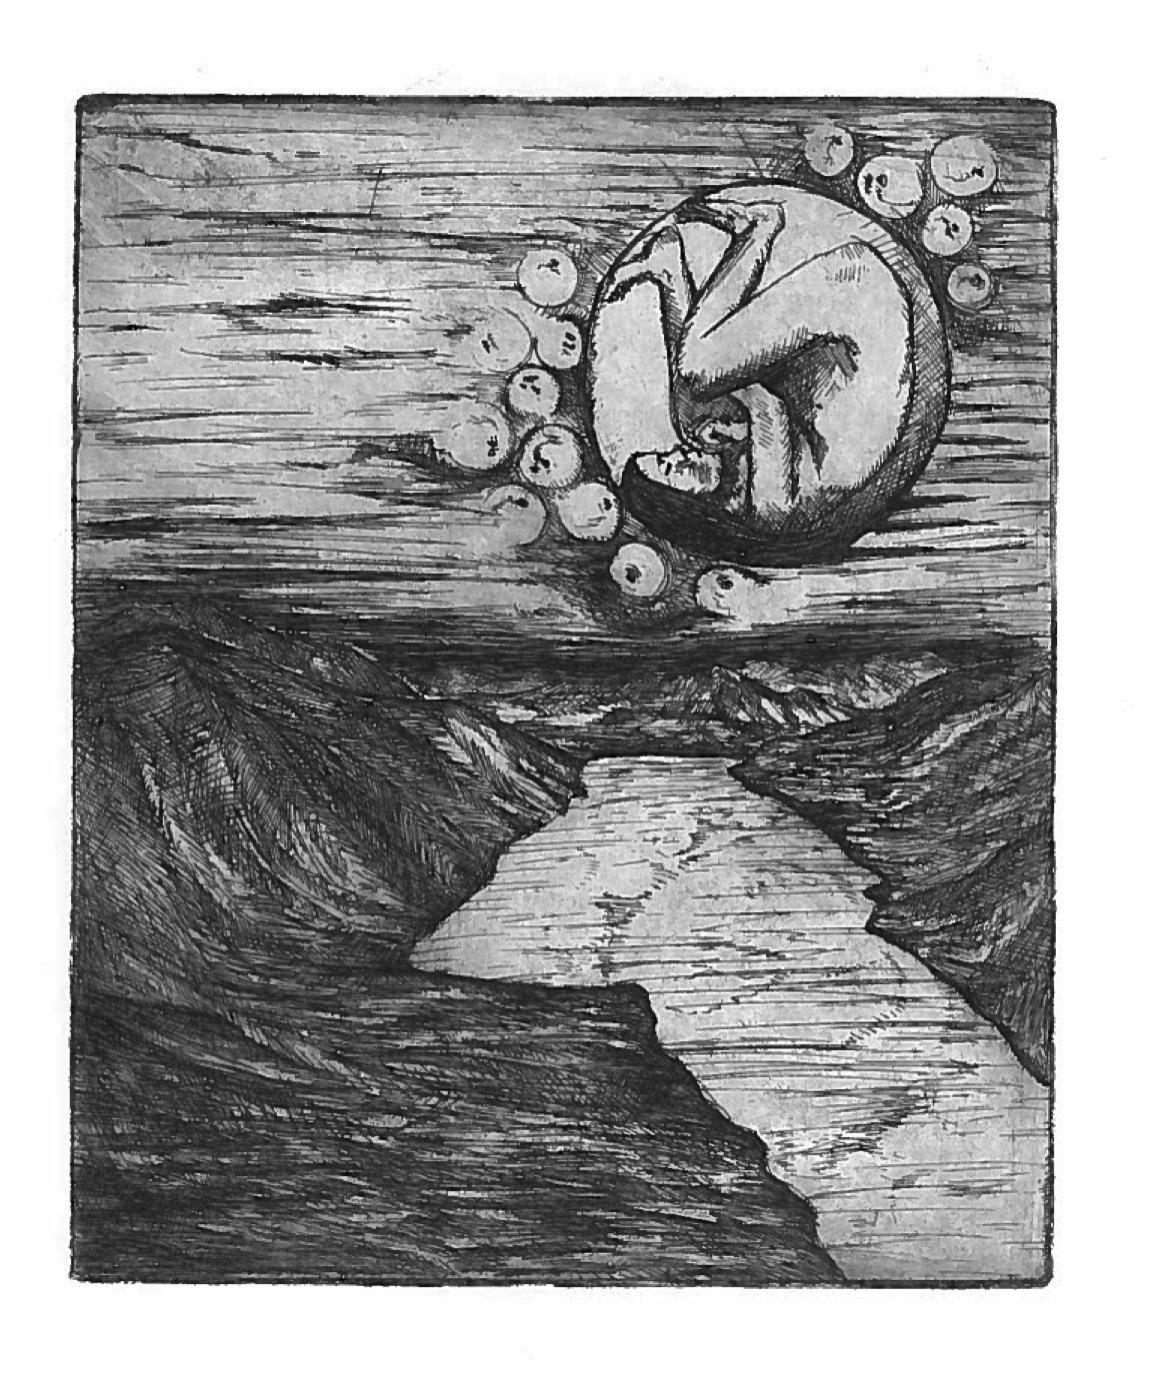 Salmon Dreams , Leila Pyle, Volume VII Issue VI